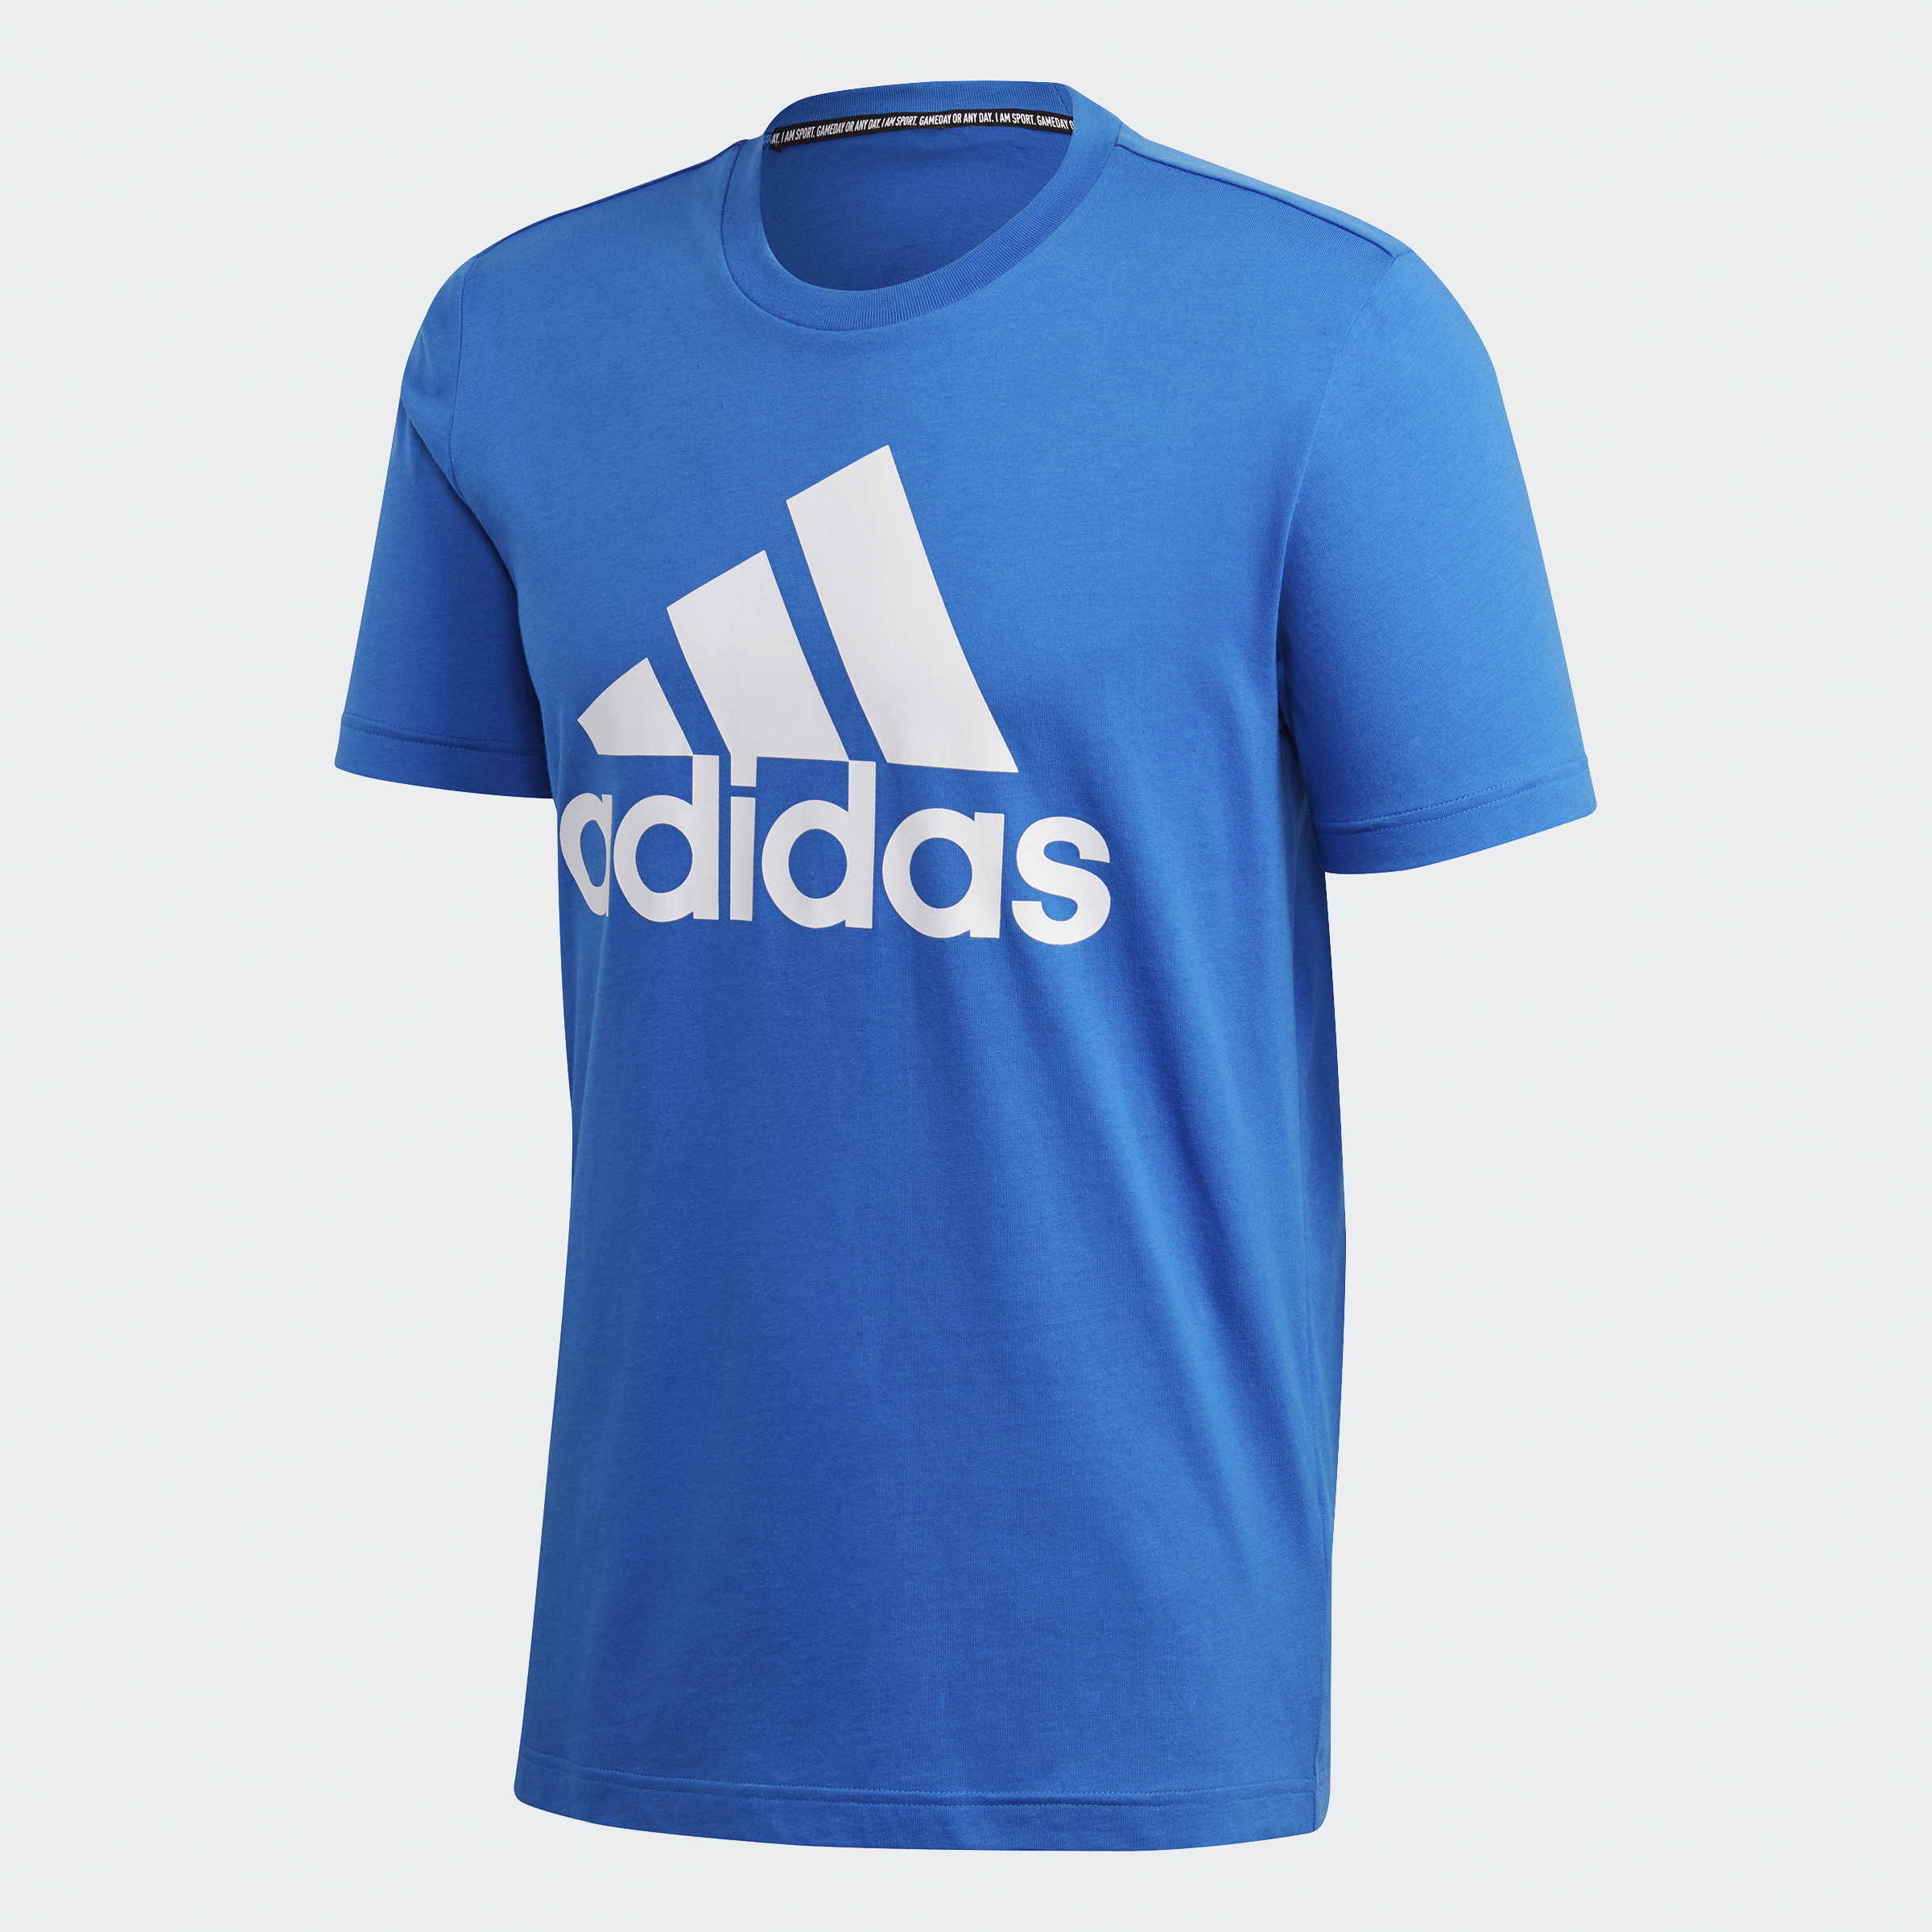 adidas-Must-Haves-Badge-of-Sport-Tee-Men-039-s-Shirts thumbnail 30